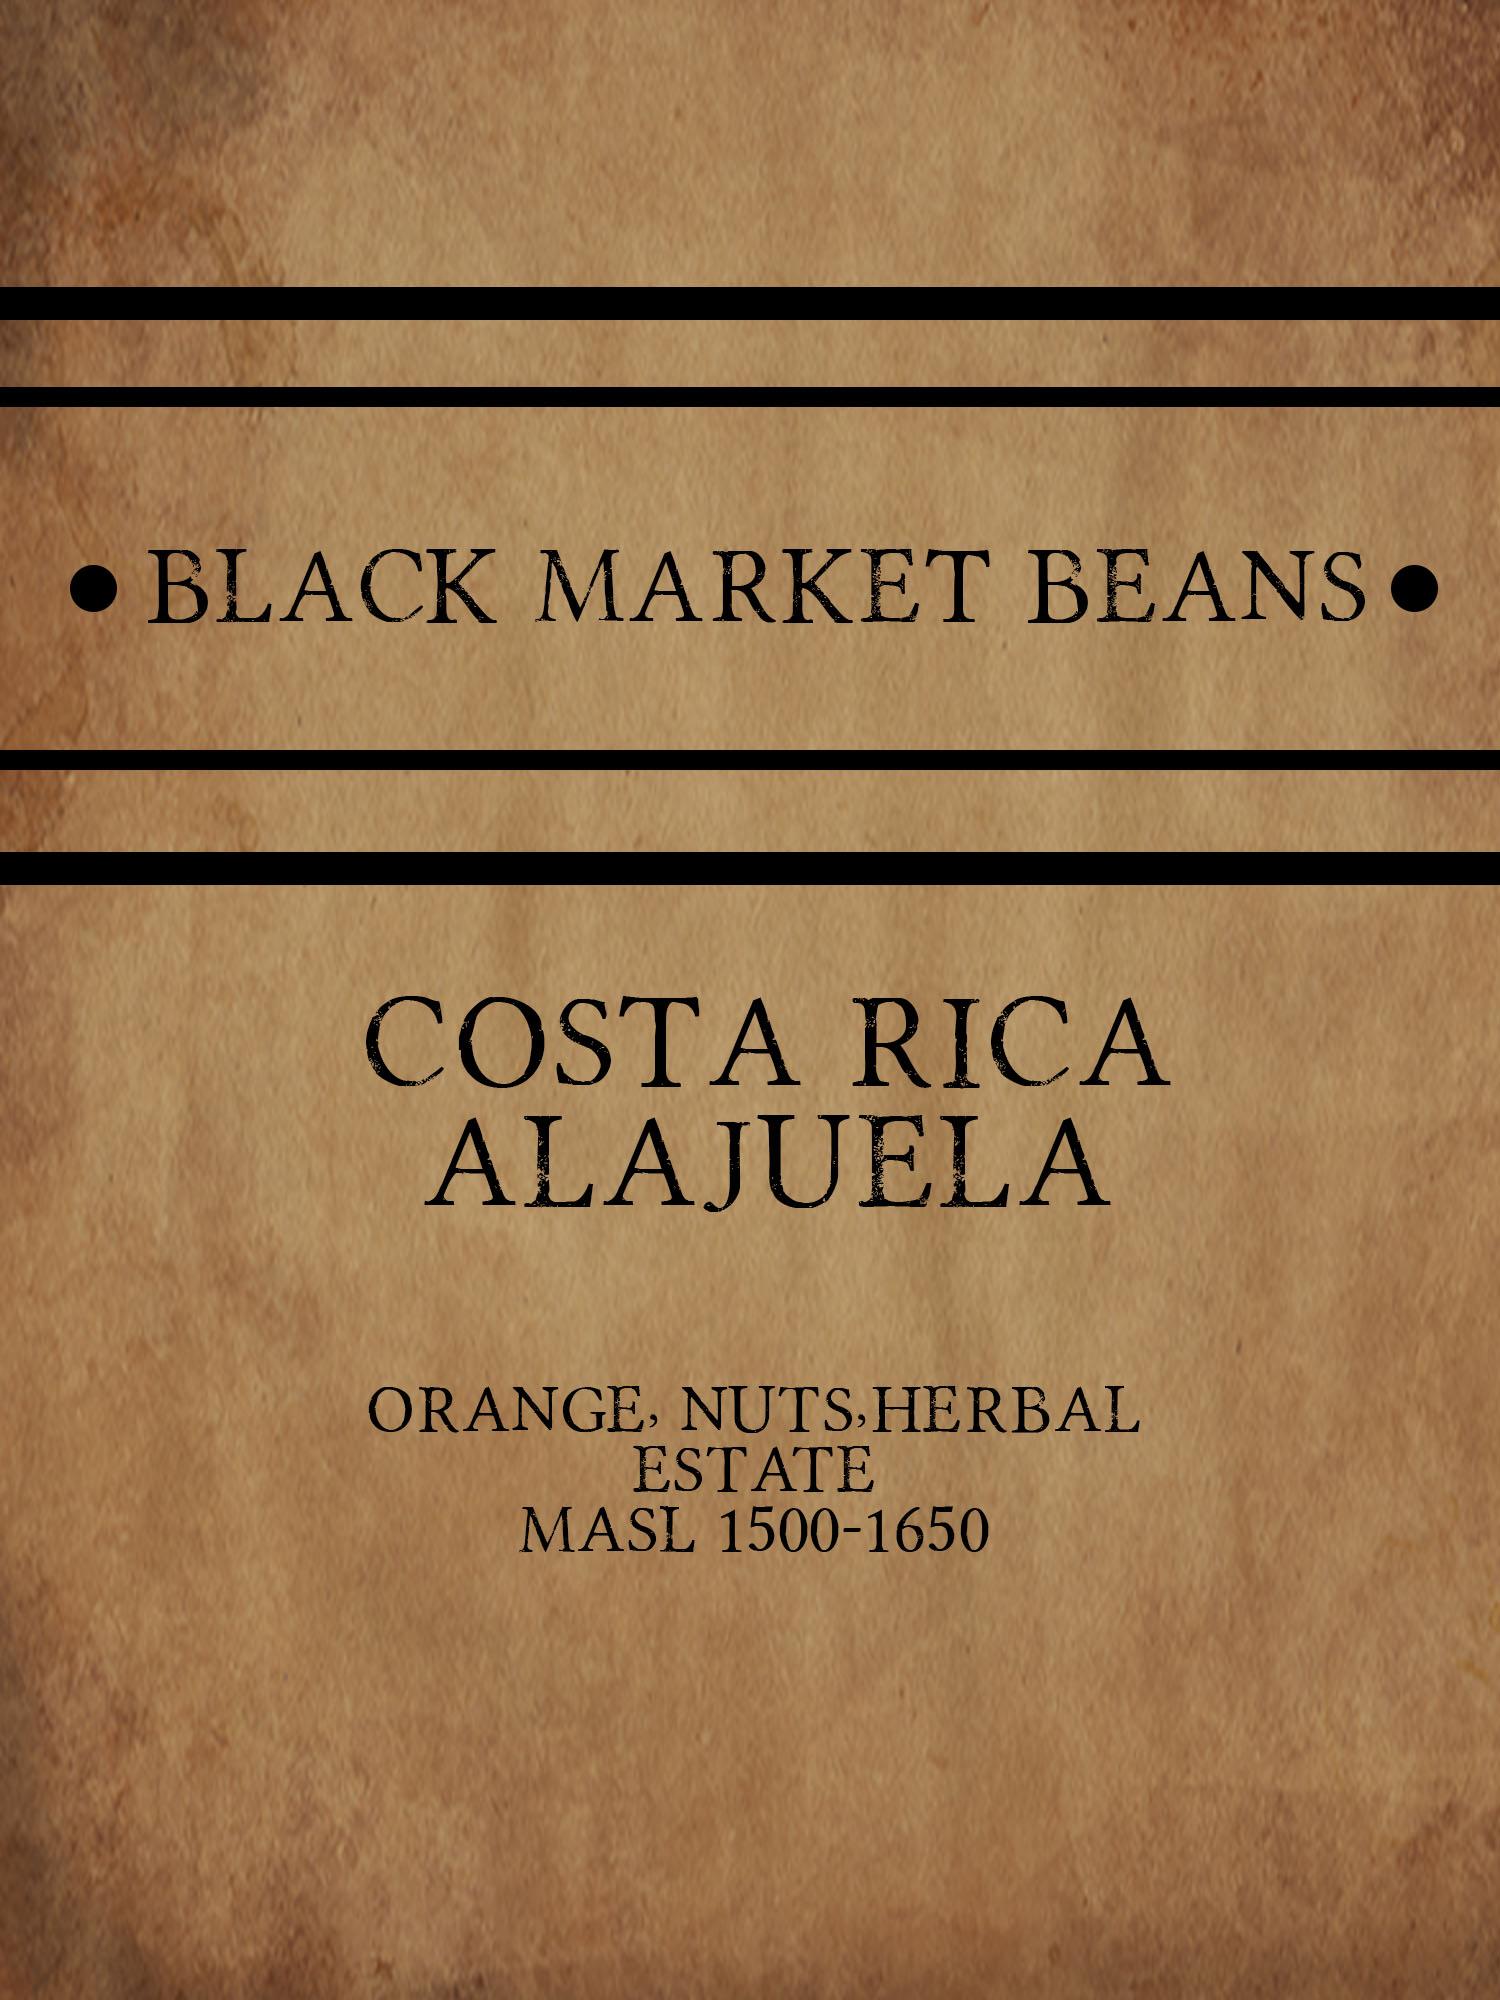 coffee_Costa Rica Alajuela.jpg